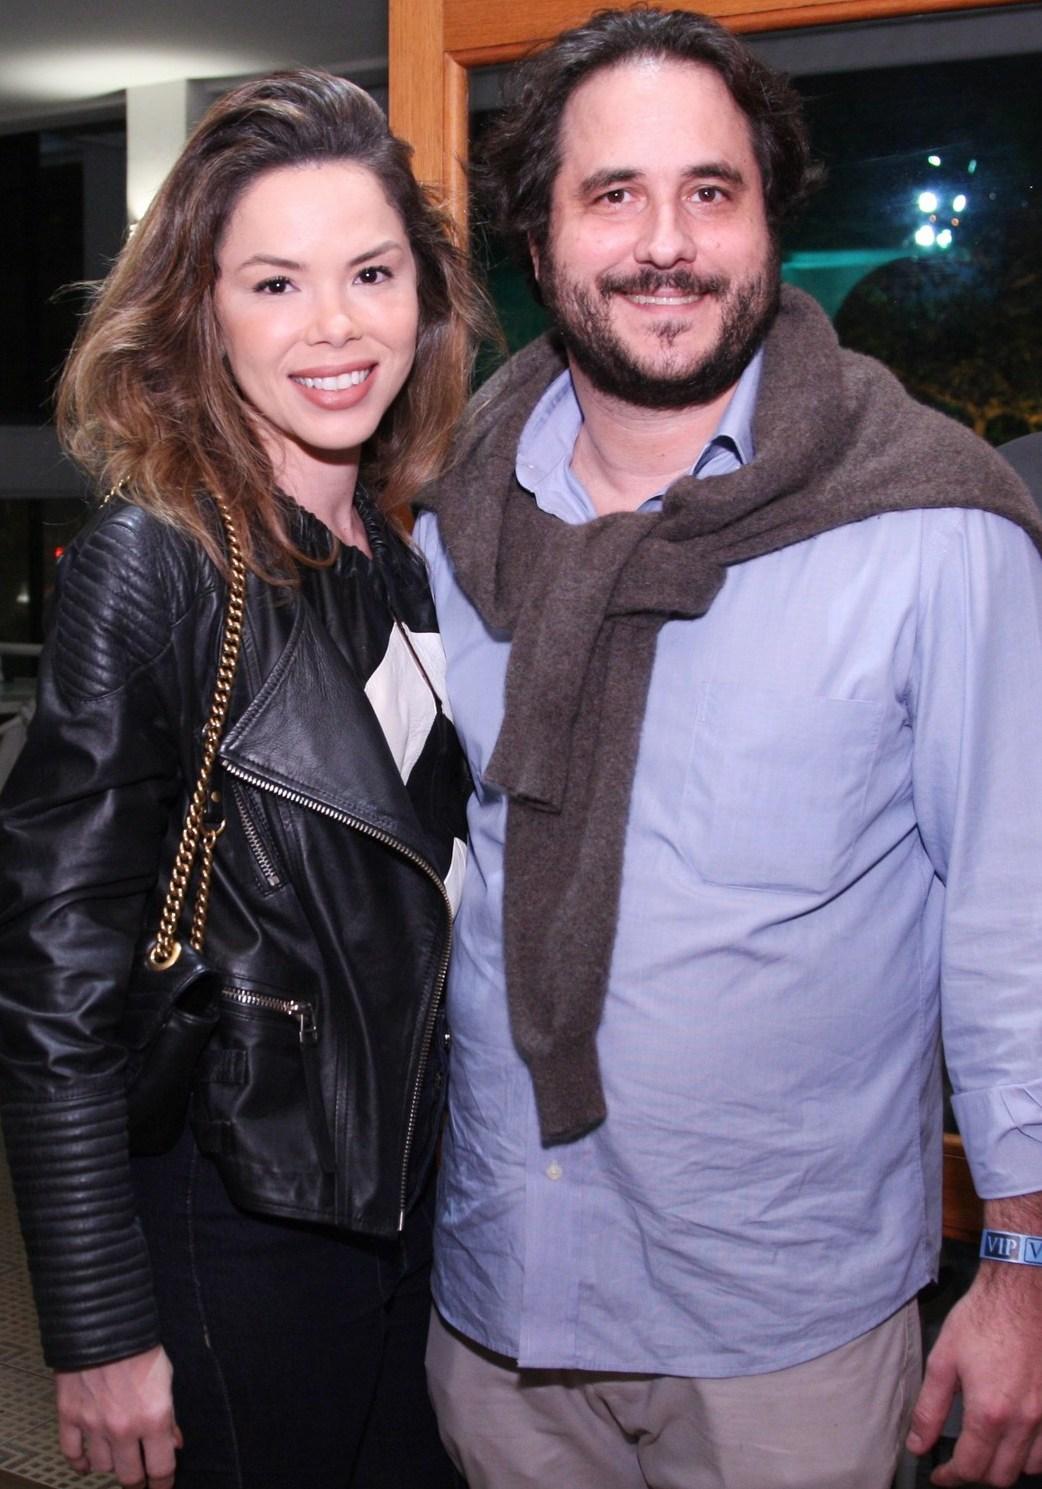 Daniela D'Antonio e Horácio Ernani - Fotos: Vera Donato